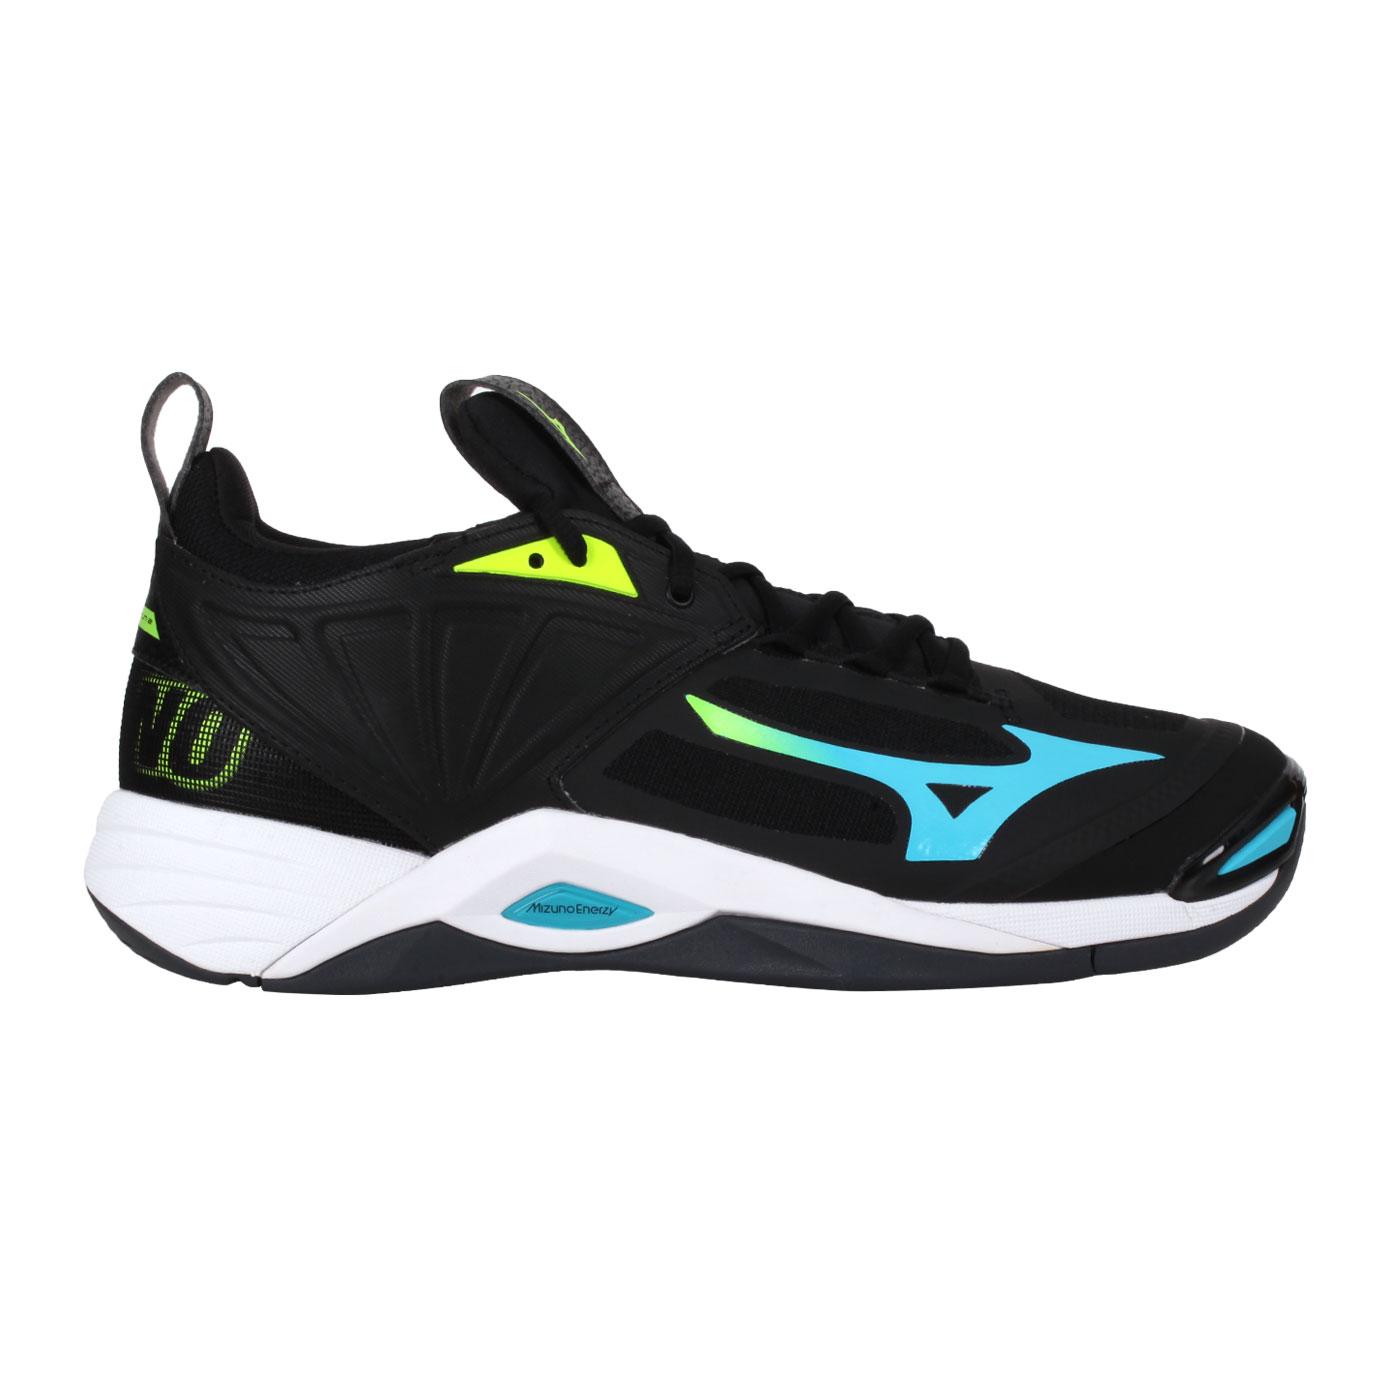 MIZUNO 男款排球鞋  @WAVE MOMENTUM 2@V1GA211223